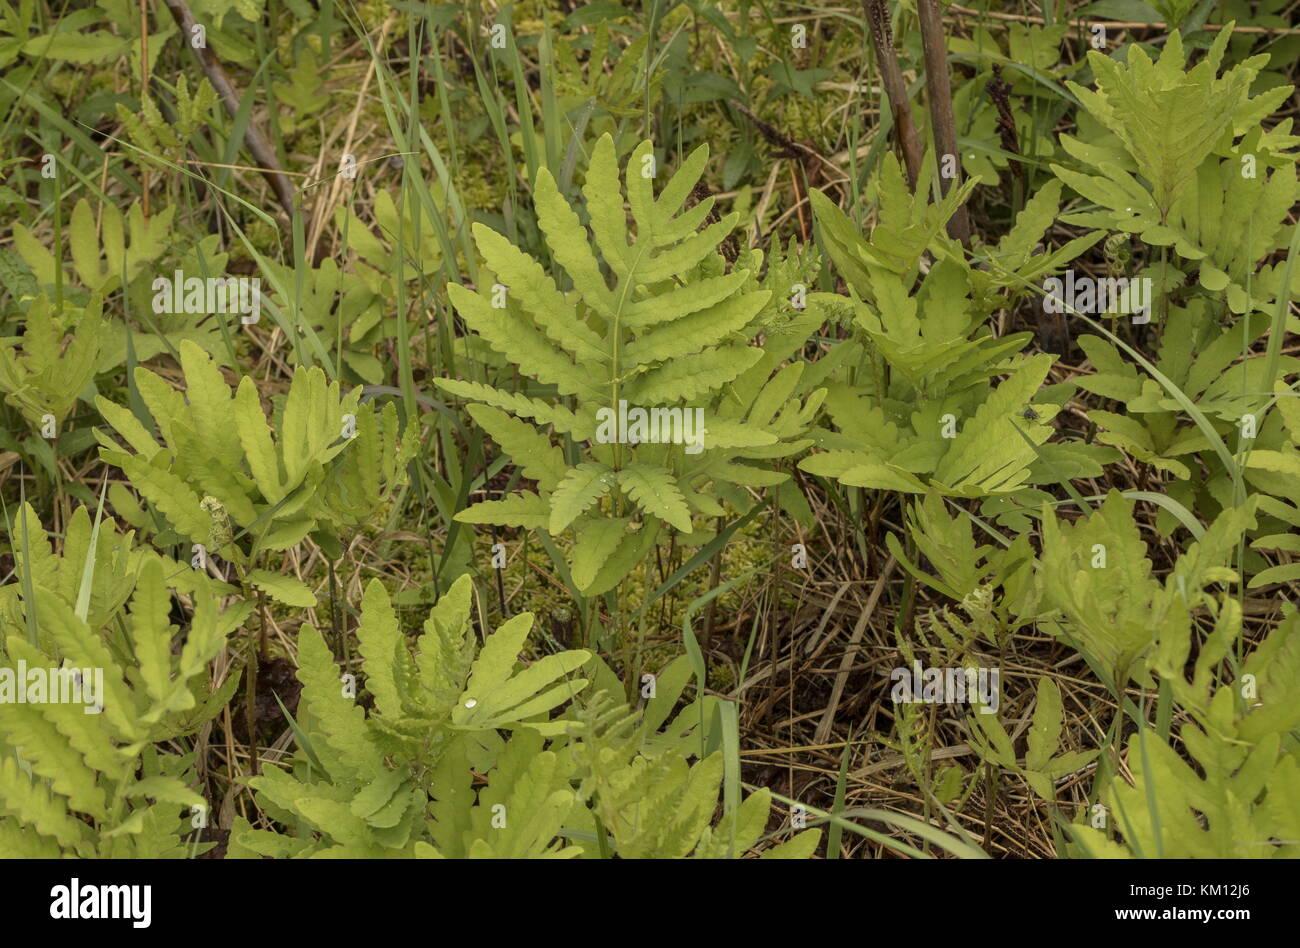 Fronds of Sensitive fern, Onoclea sensibilis, in summer, Newfoundland. - Stock Image